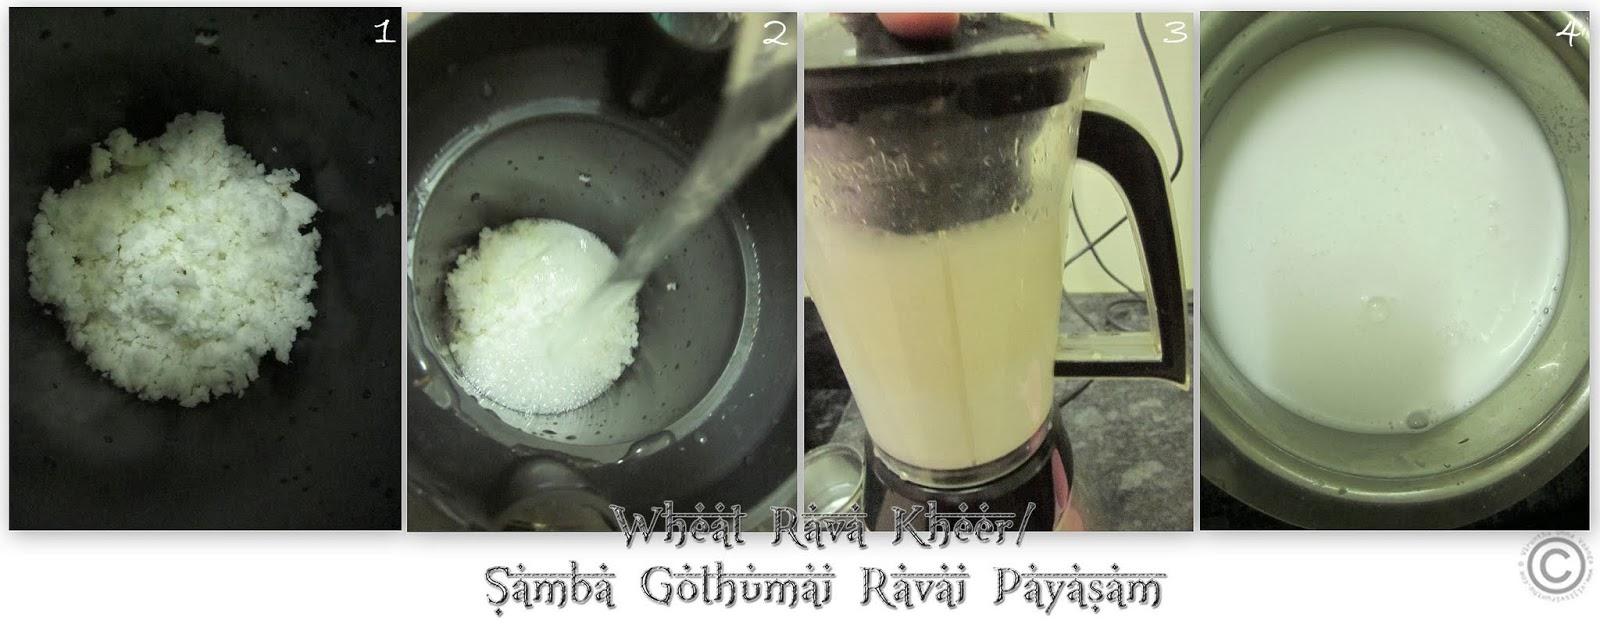 samba-gothuma-payasam